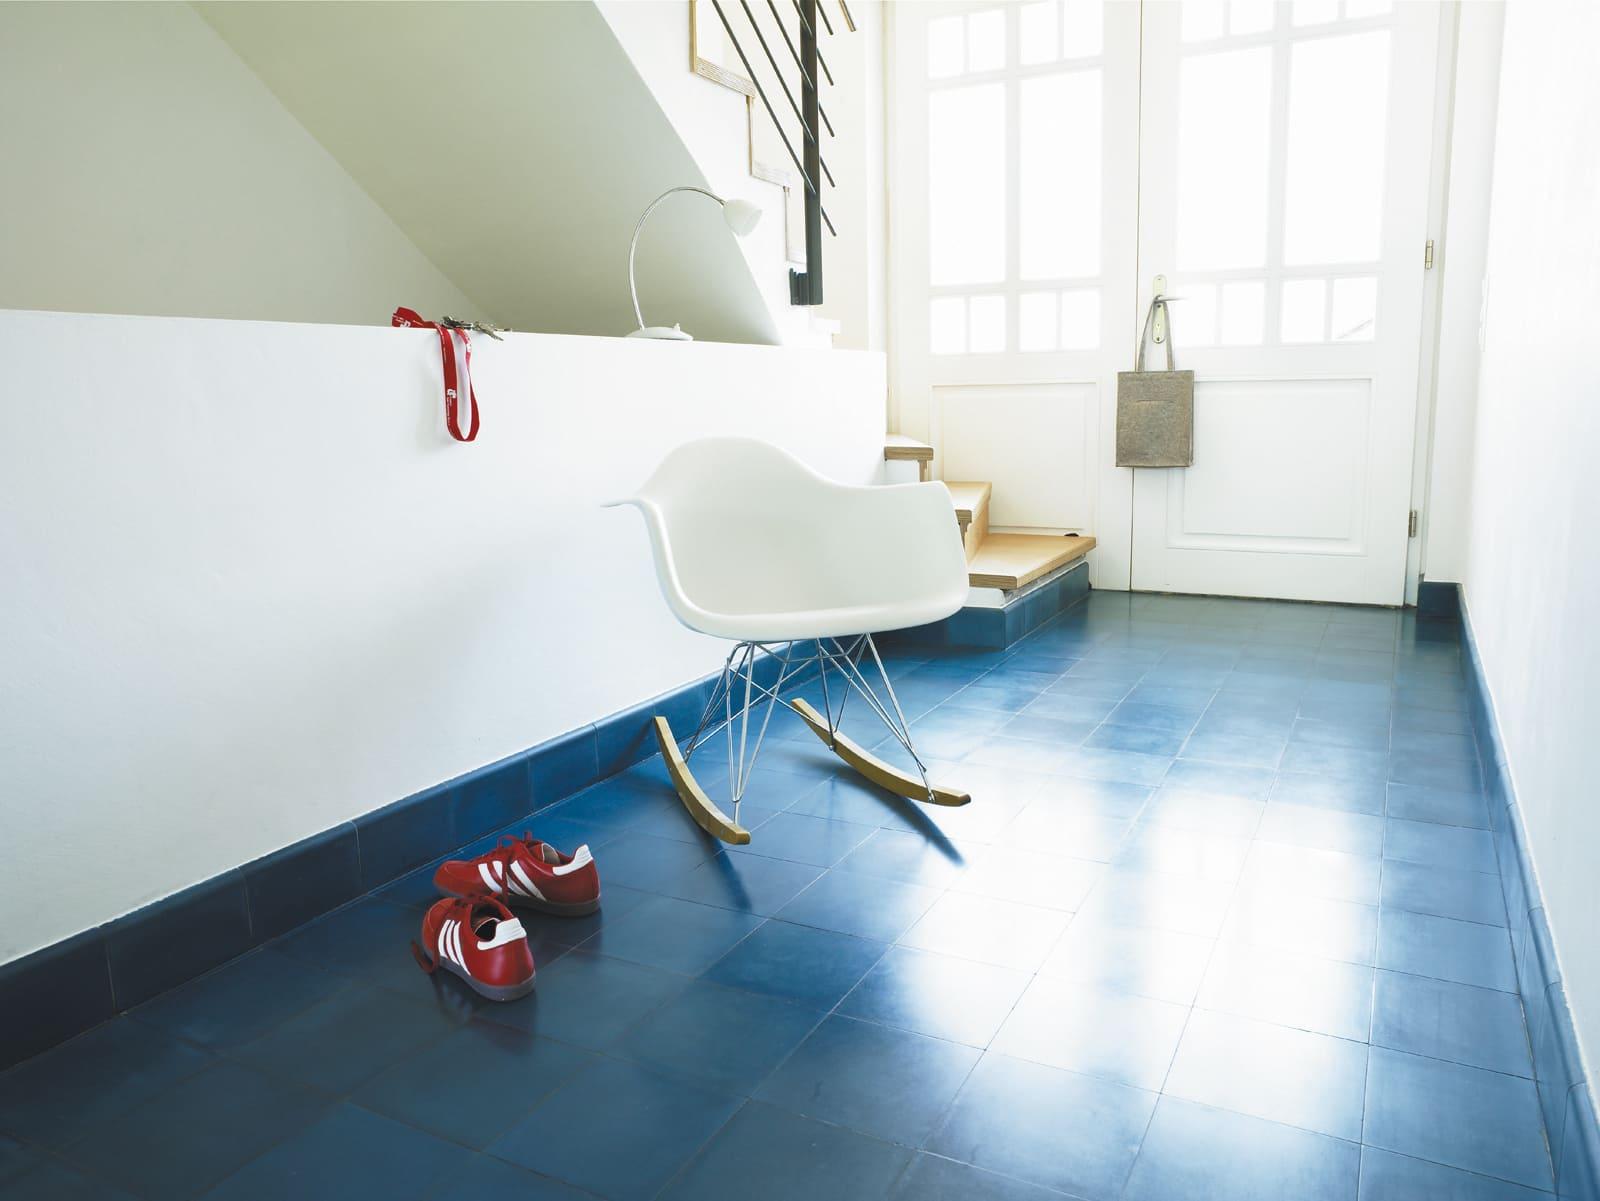 zementfliesen-terrazzofliesen-kreidefarbe-terrazzo-fugenlos-viaplatten-43-sockel-eingang   43